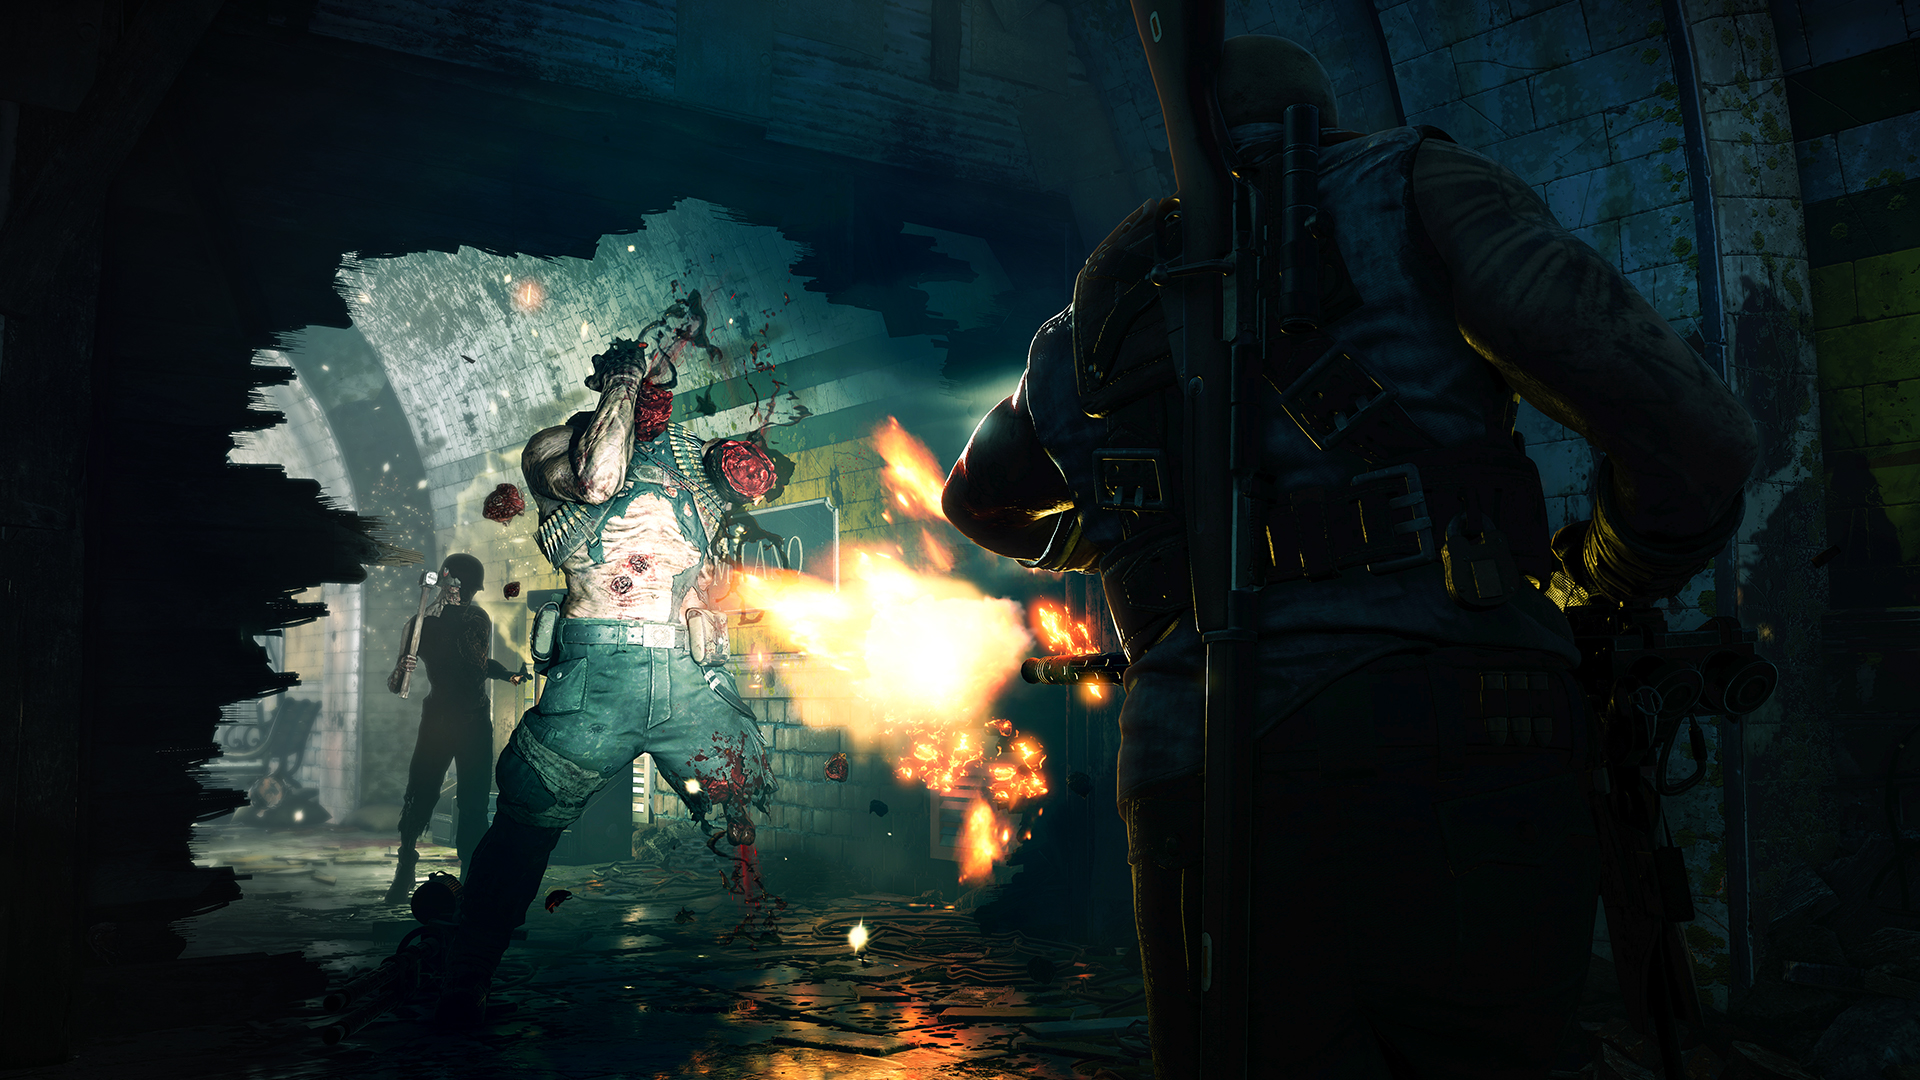 Скриншот 0 - Zombie Army 4: Dead War Super Deluxe+АВТОАКТИВАЦИЯ🔴 Epic Games Store